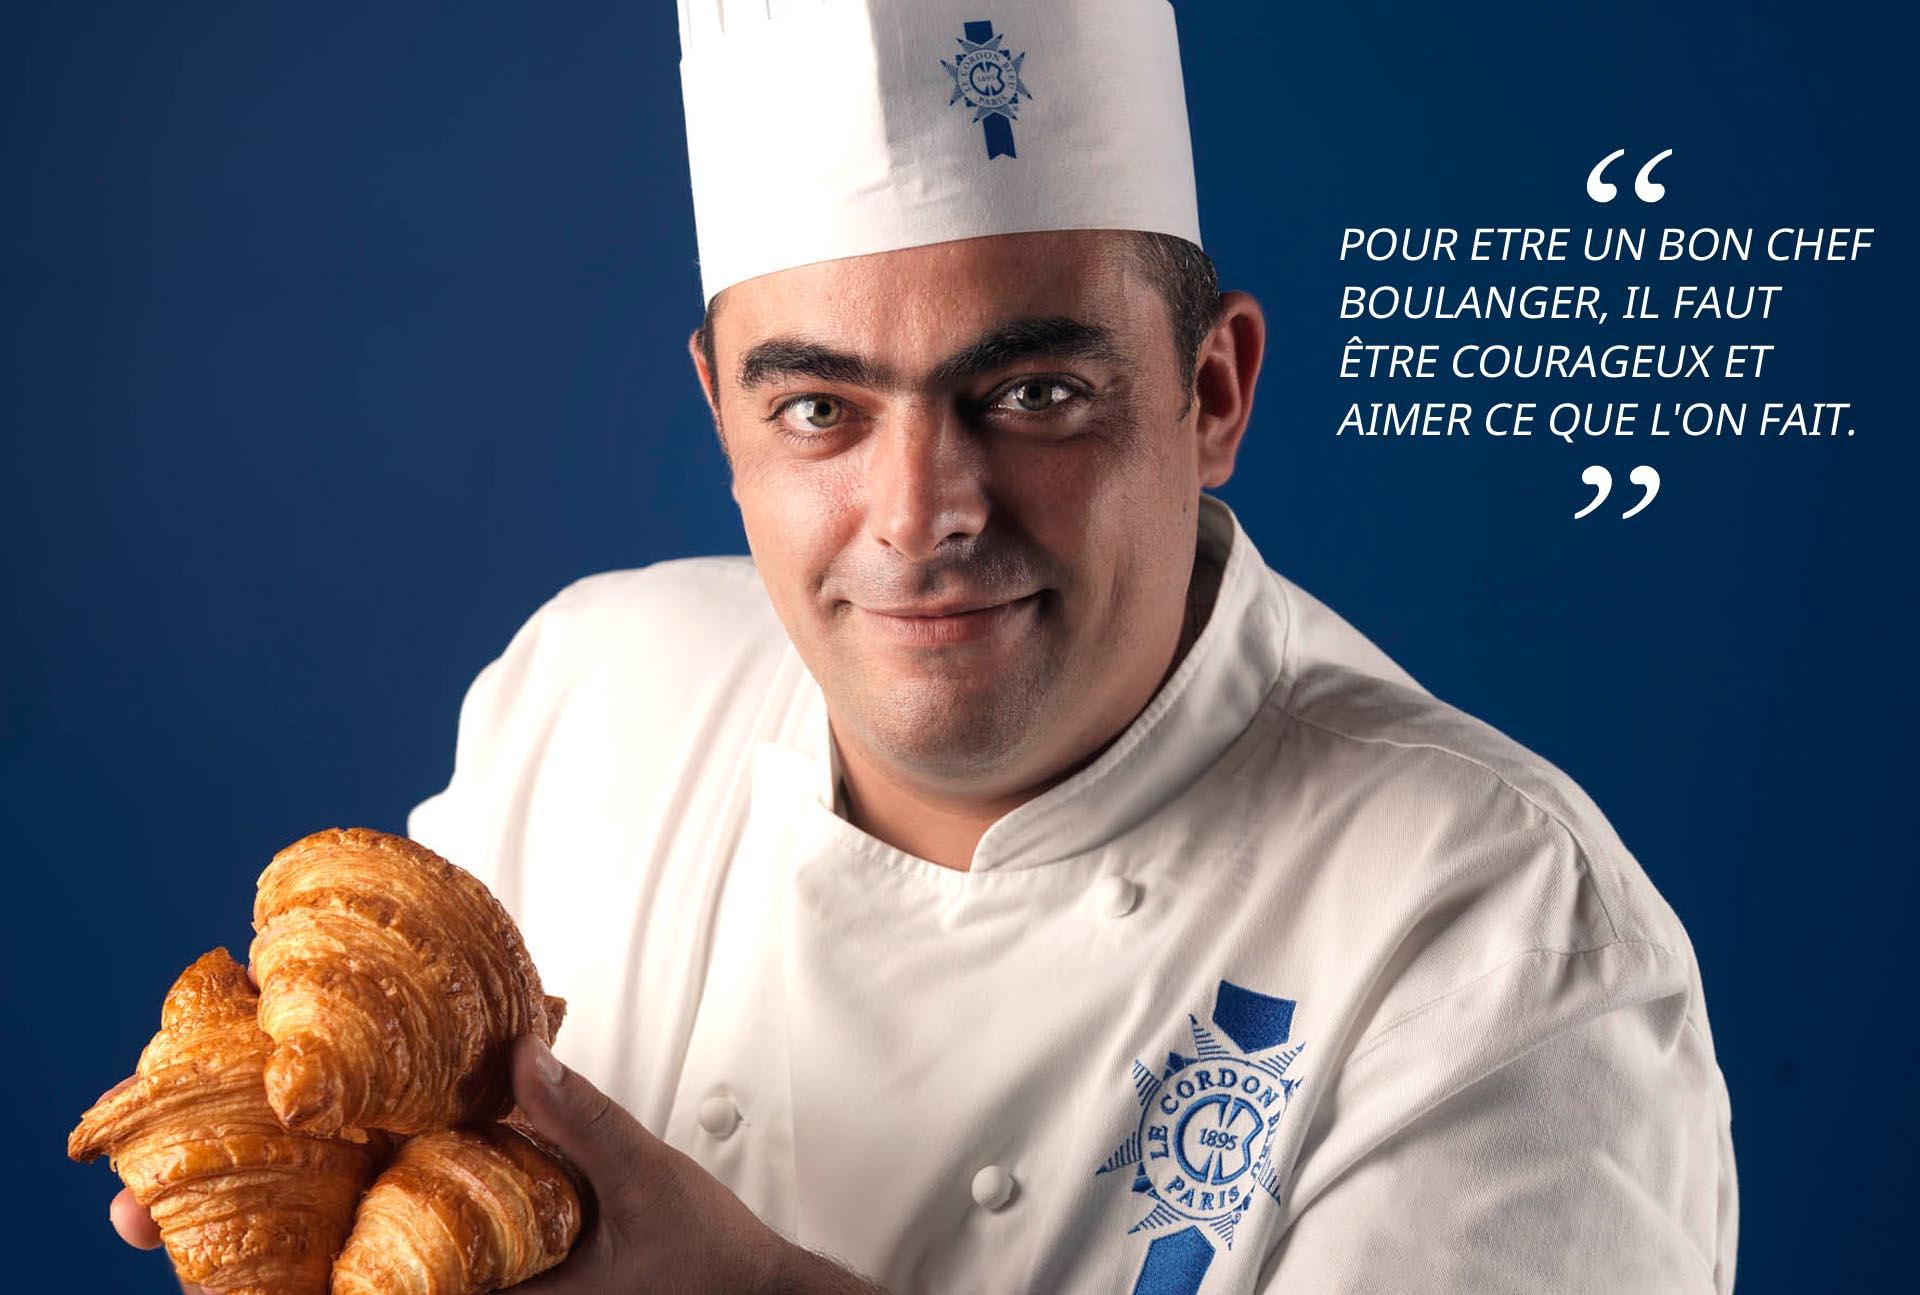 Chef de boulangerie Vincent Somoza